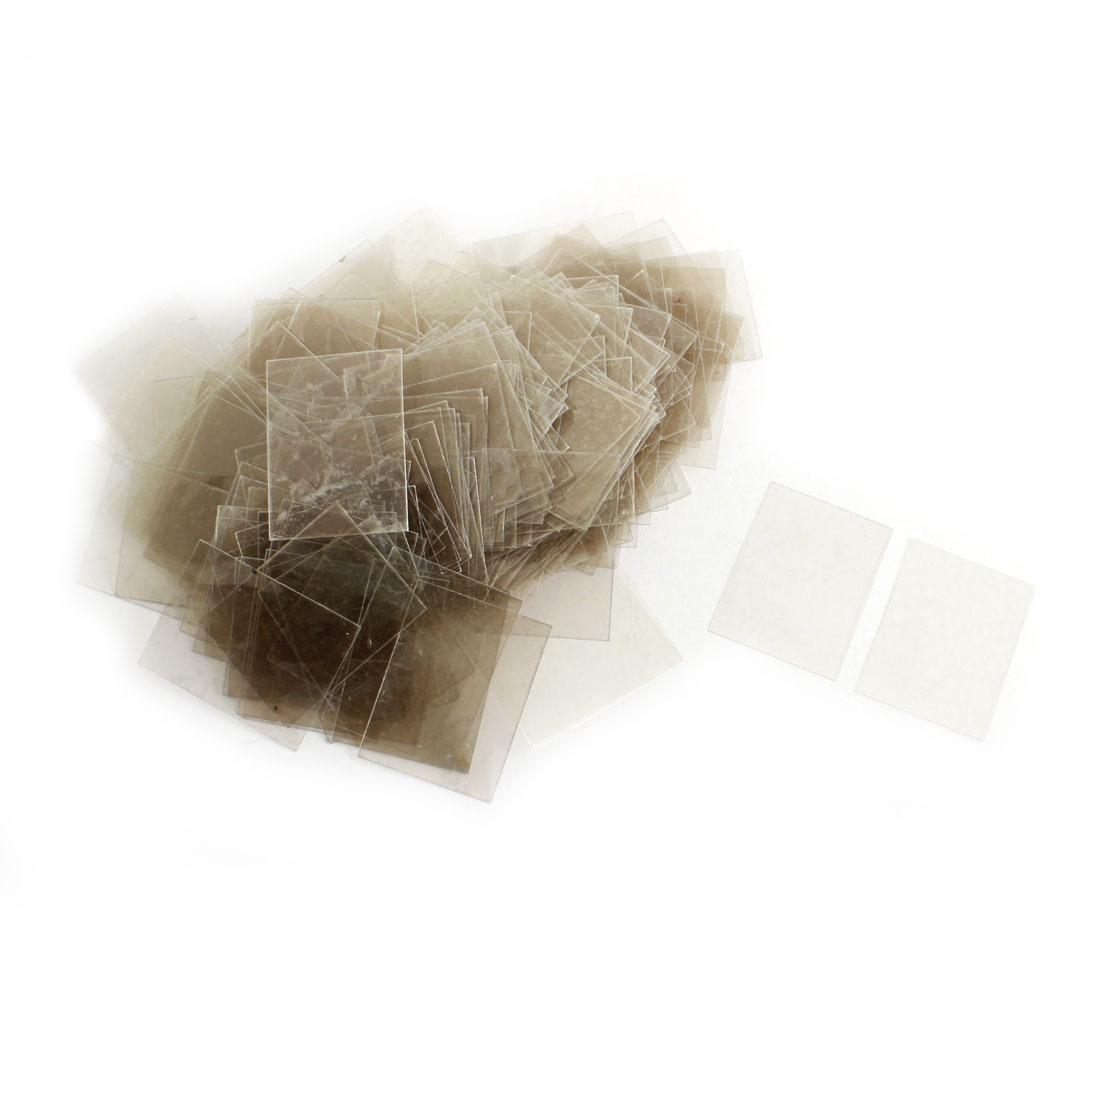 300pcs 22mm x 29cm x 0.09mm Mica Insulator Sheets Plates